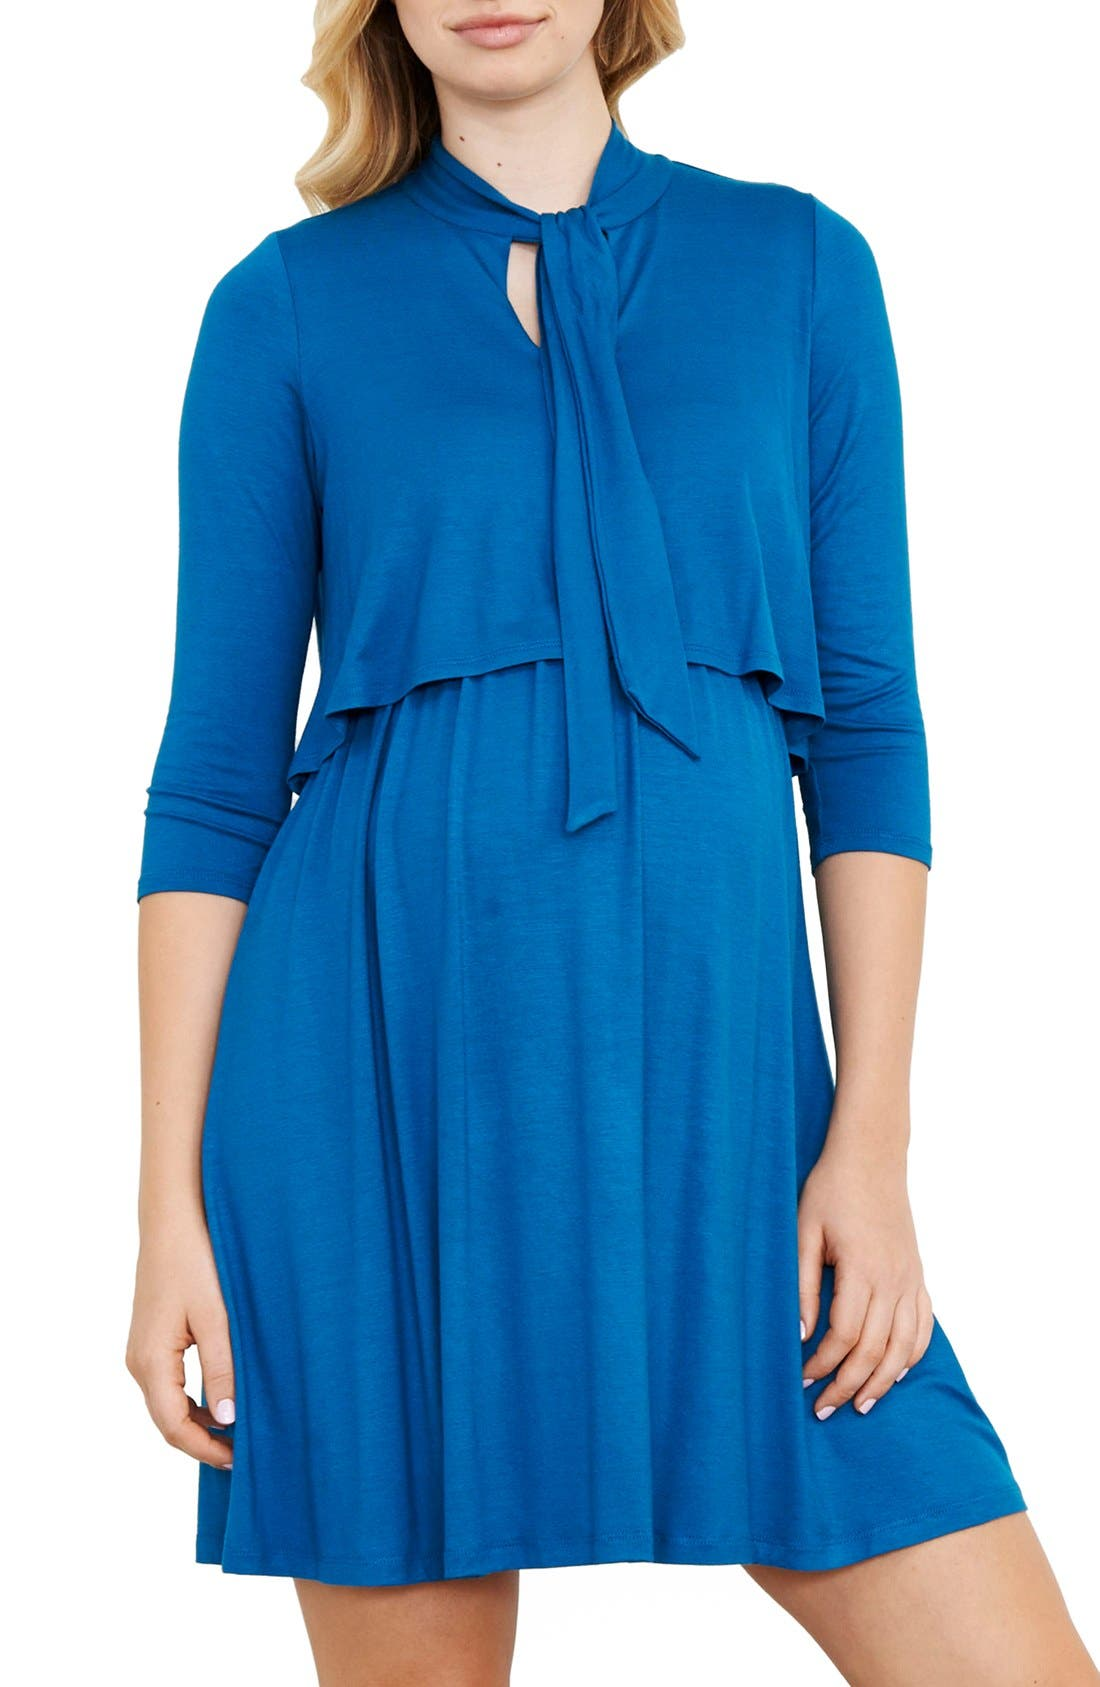 Maternal America Tie Neck Maternity Dress